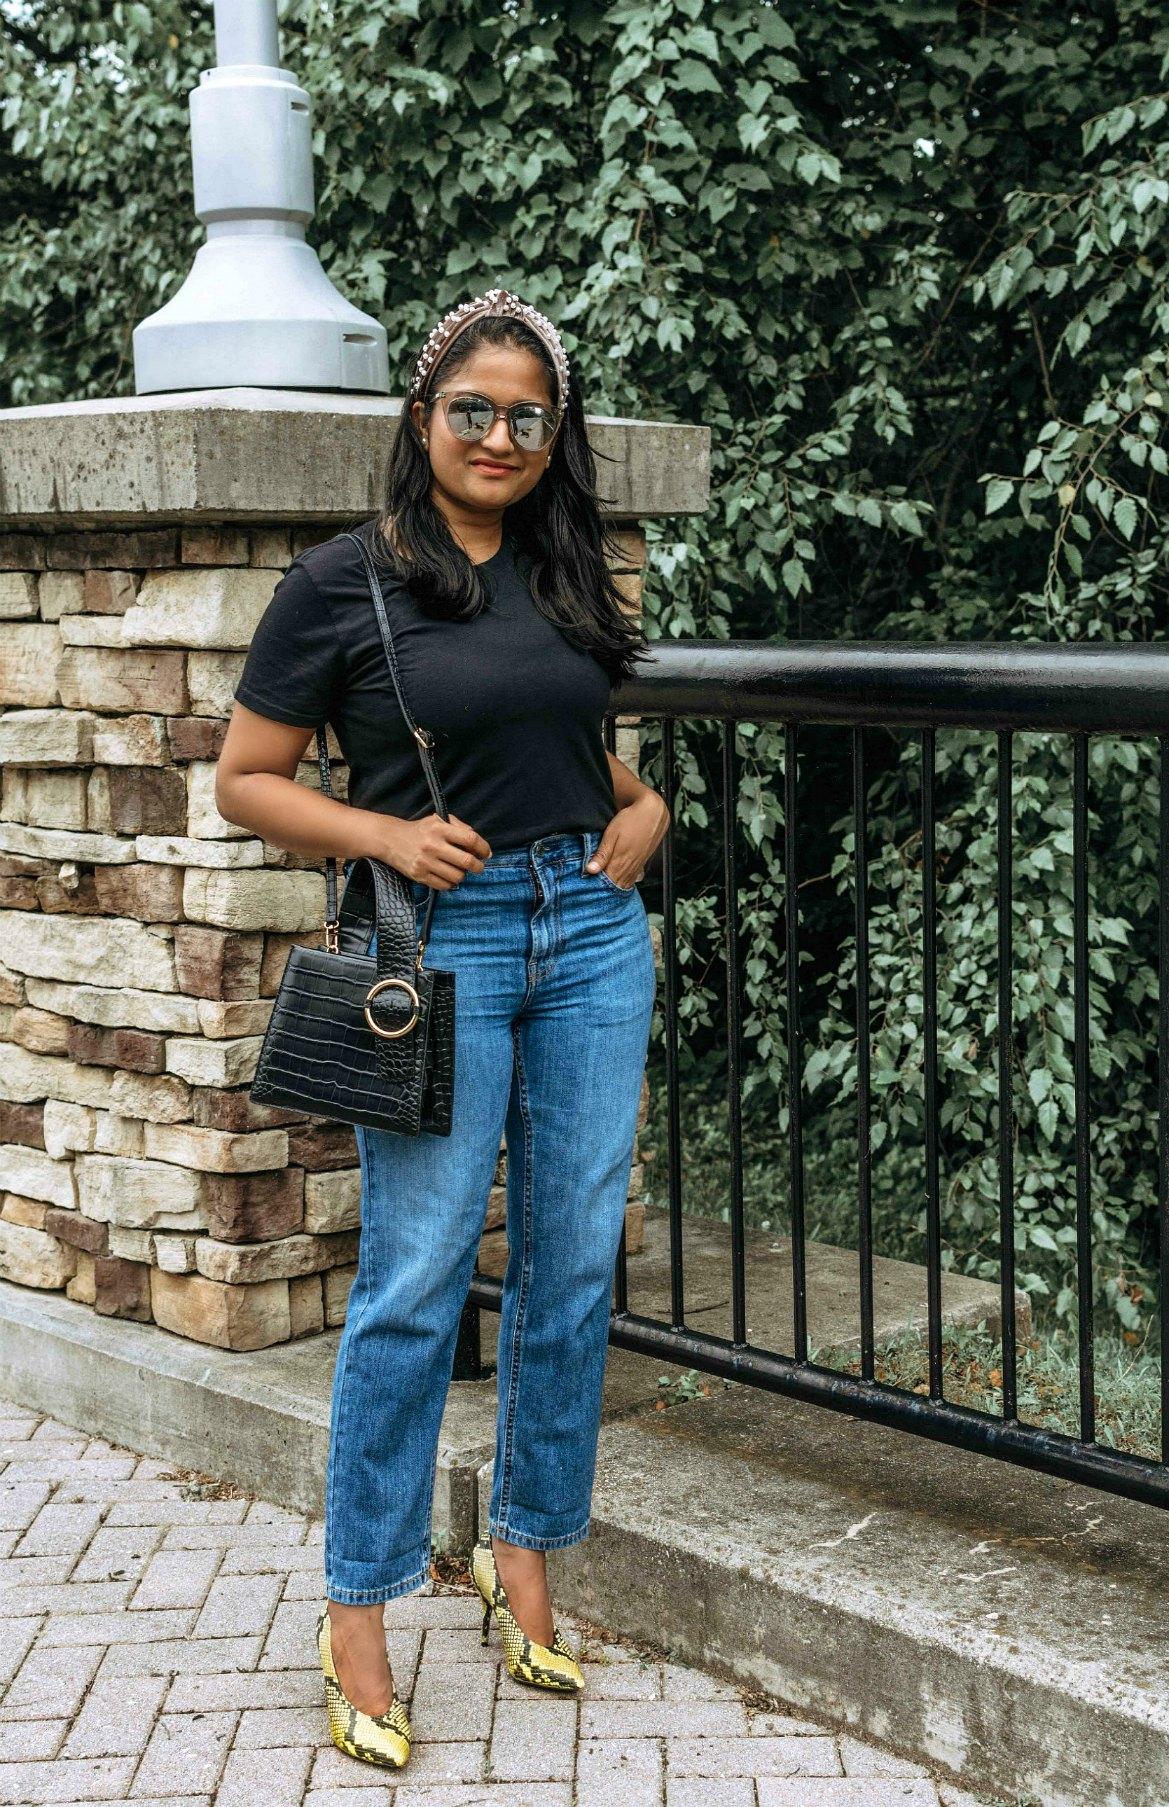 Wearing Everlane summer jeans, Cotton Box-Cut Tee, Pearl headband, Parisa Wang Enchanted Top Handle Bag 1